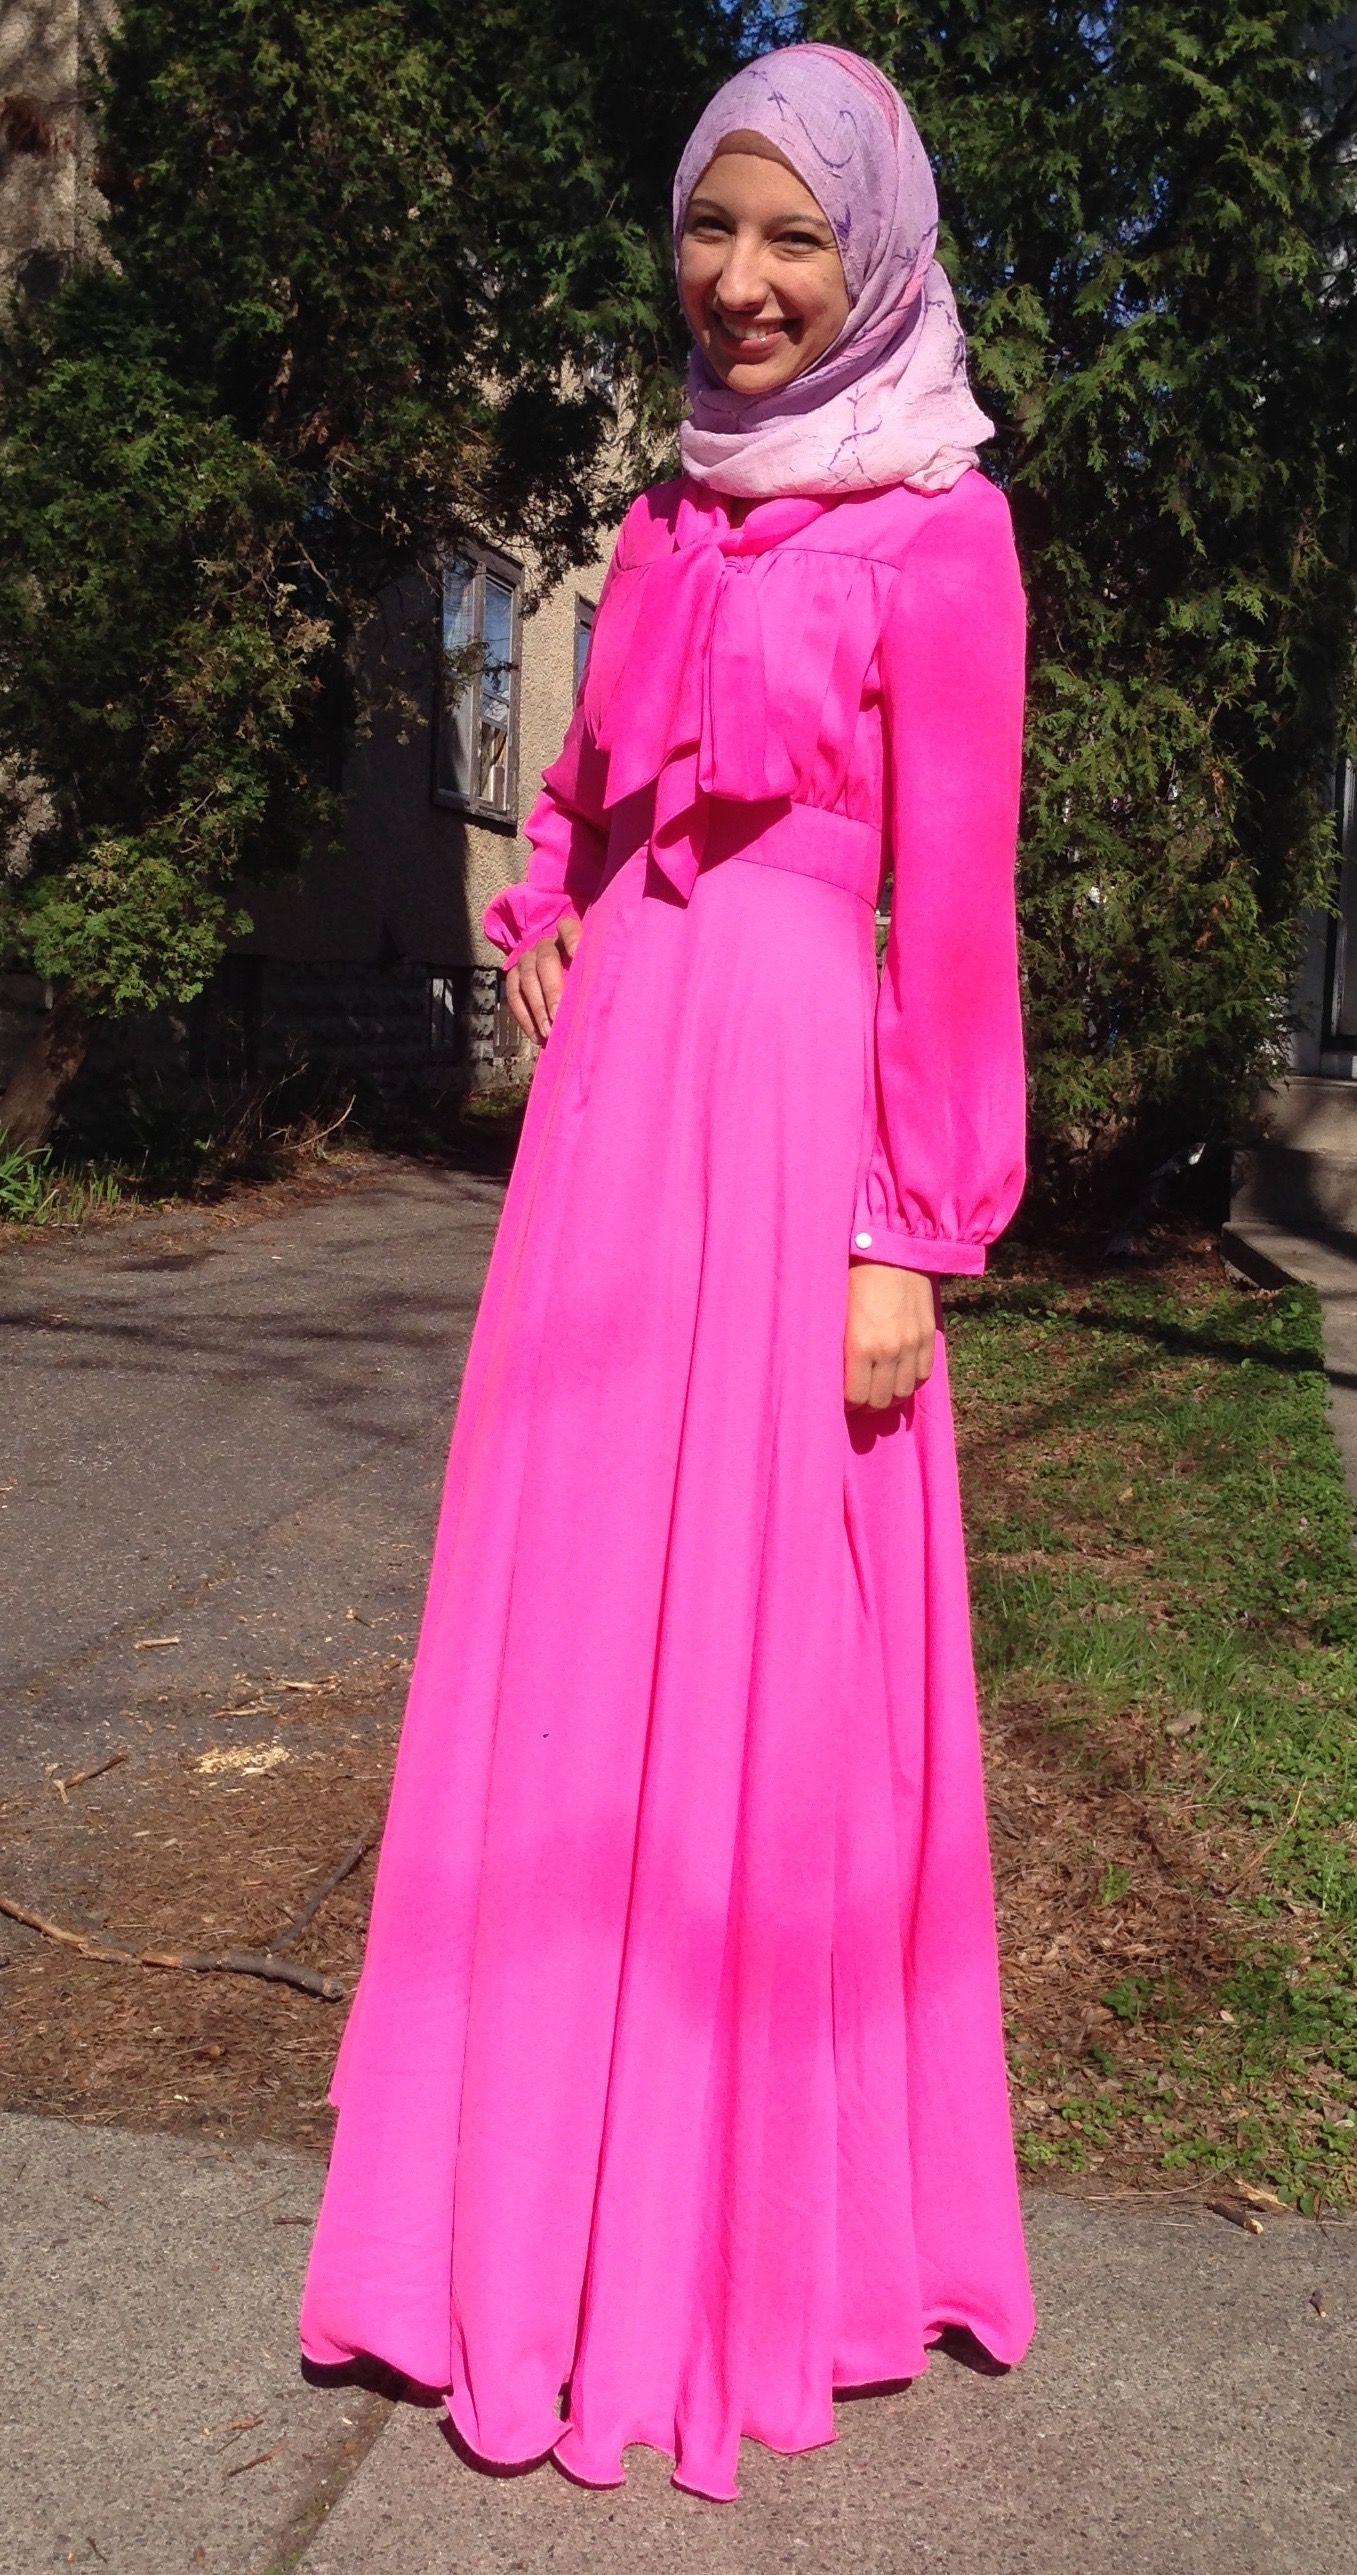 Asos Design Asos Bright Floral Maxi Dress With Ruffle Sleeves Bright Floral Maxi Dress Maxi Dress Floral Maxi Dress